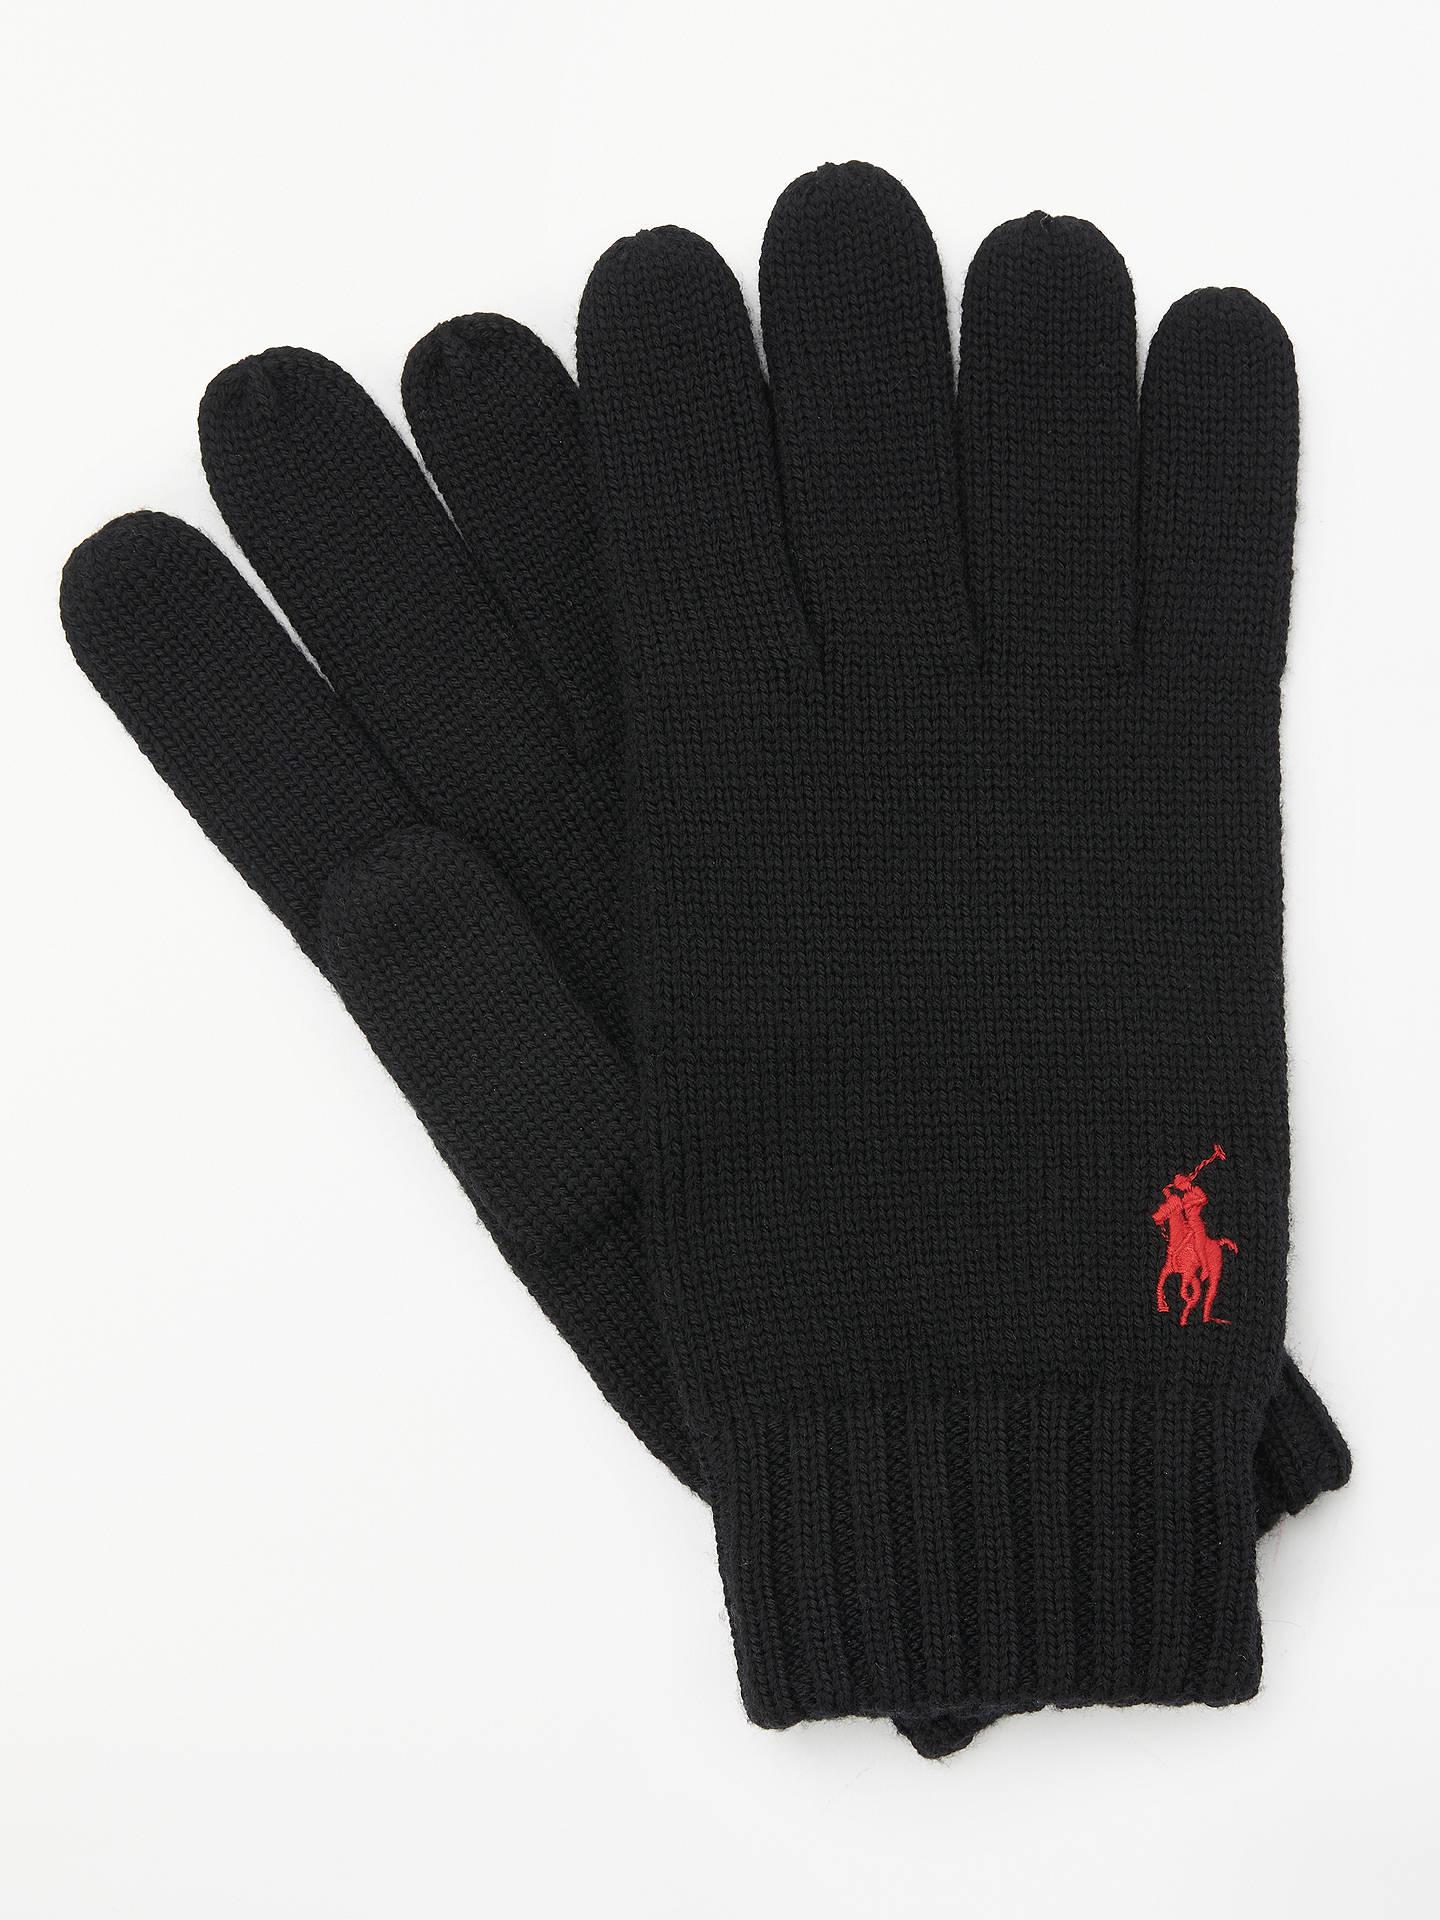 9d703f125 Polo Ralph Lauren Merino Wool Gloves, Black